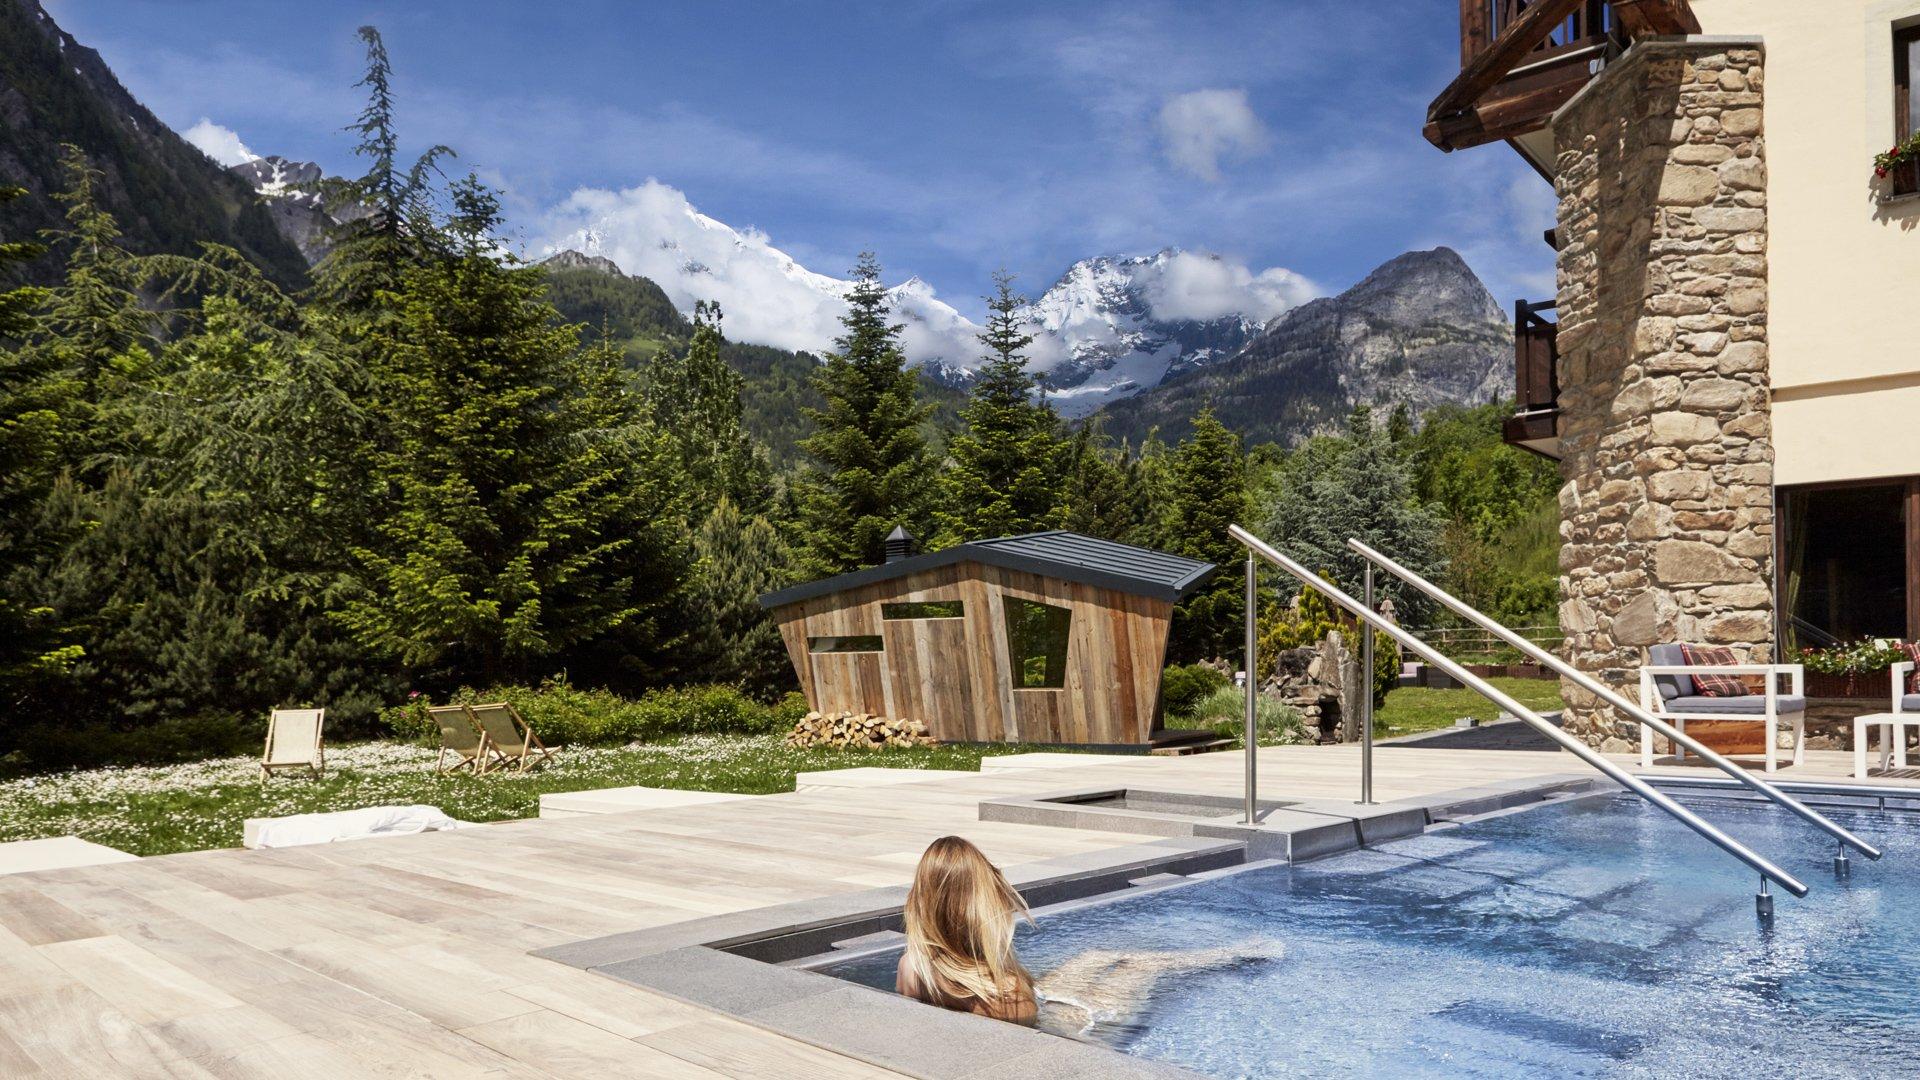 QC Termemontebianco spa e resort